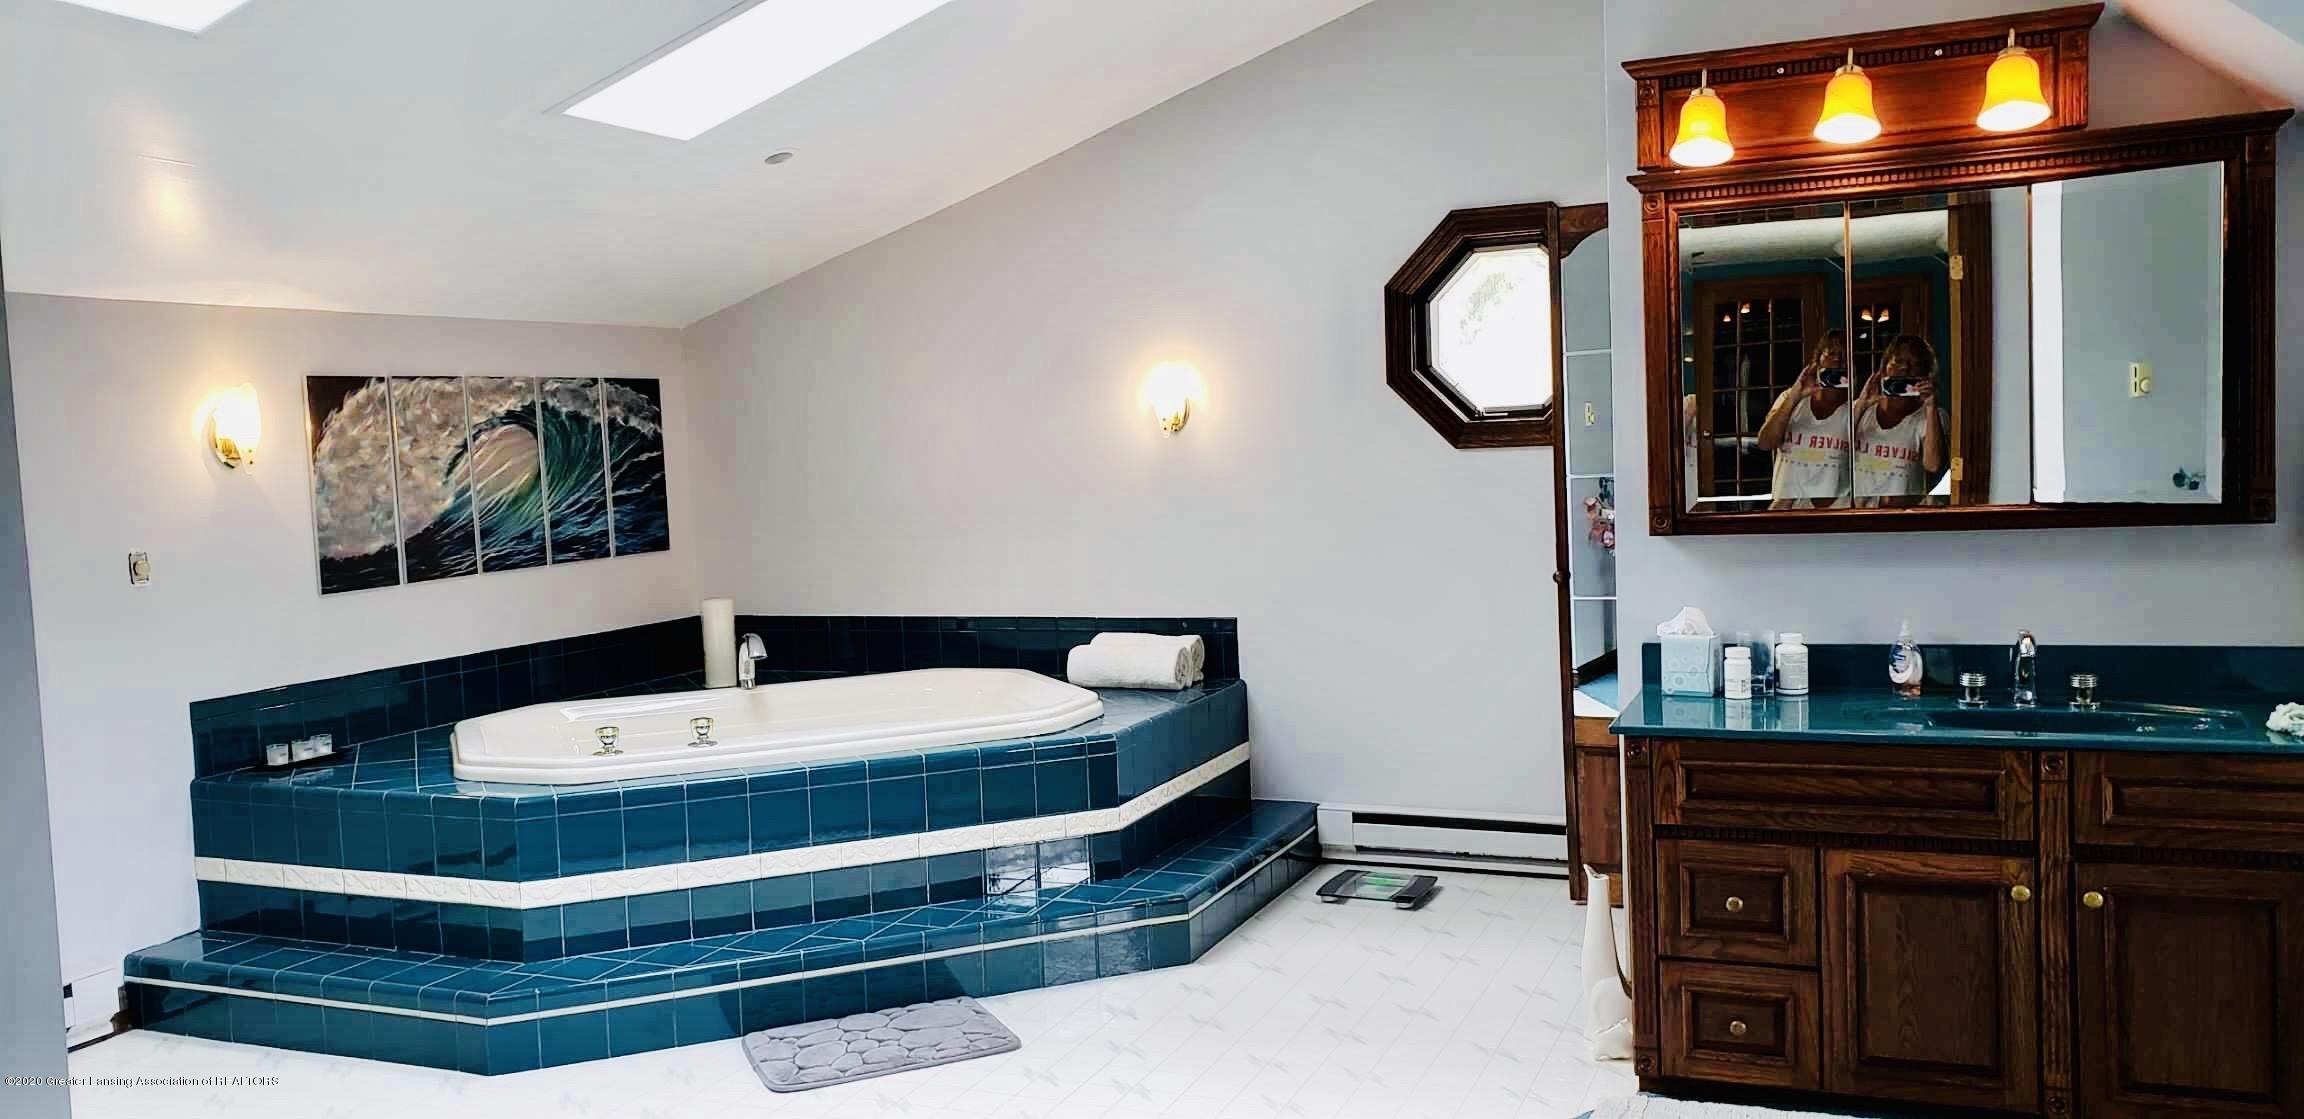 7346 W Cutler Rd - MASTER BATHROOM OVERSIZED WHIRLPOOL - 48